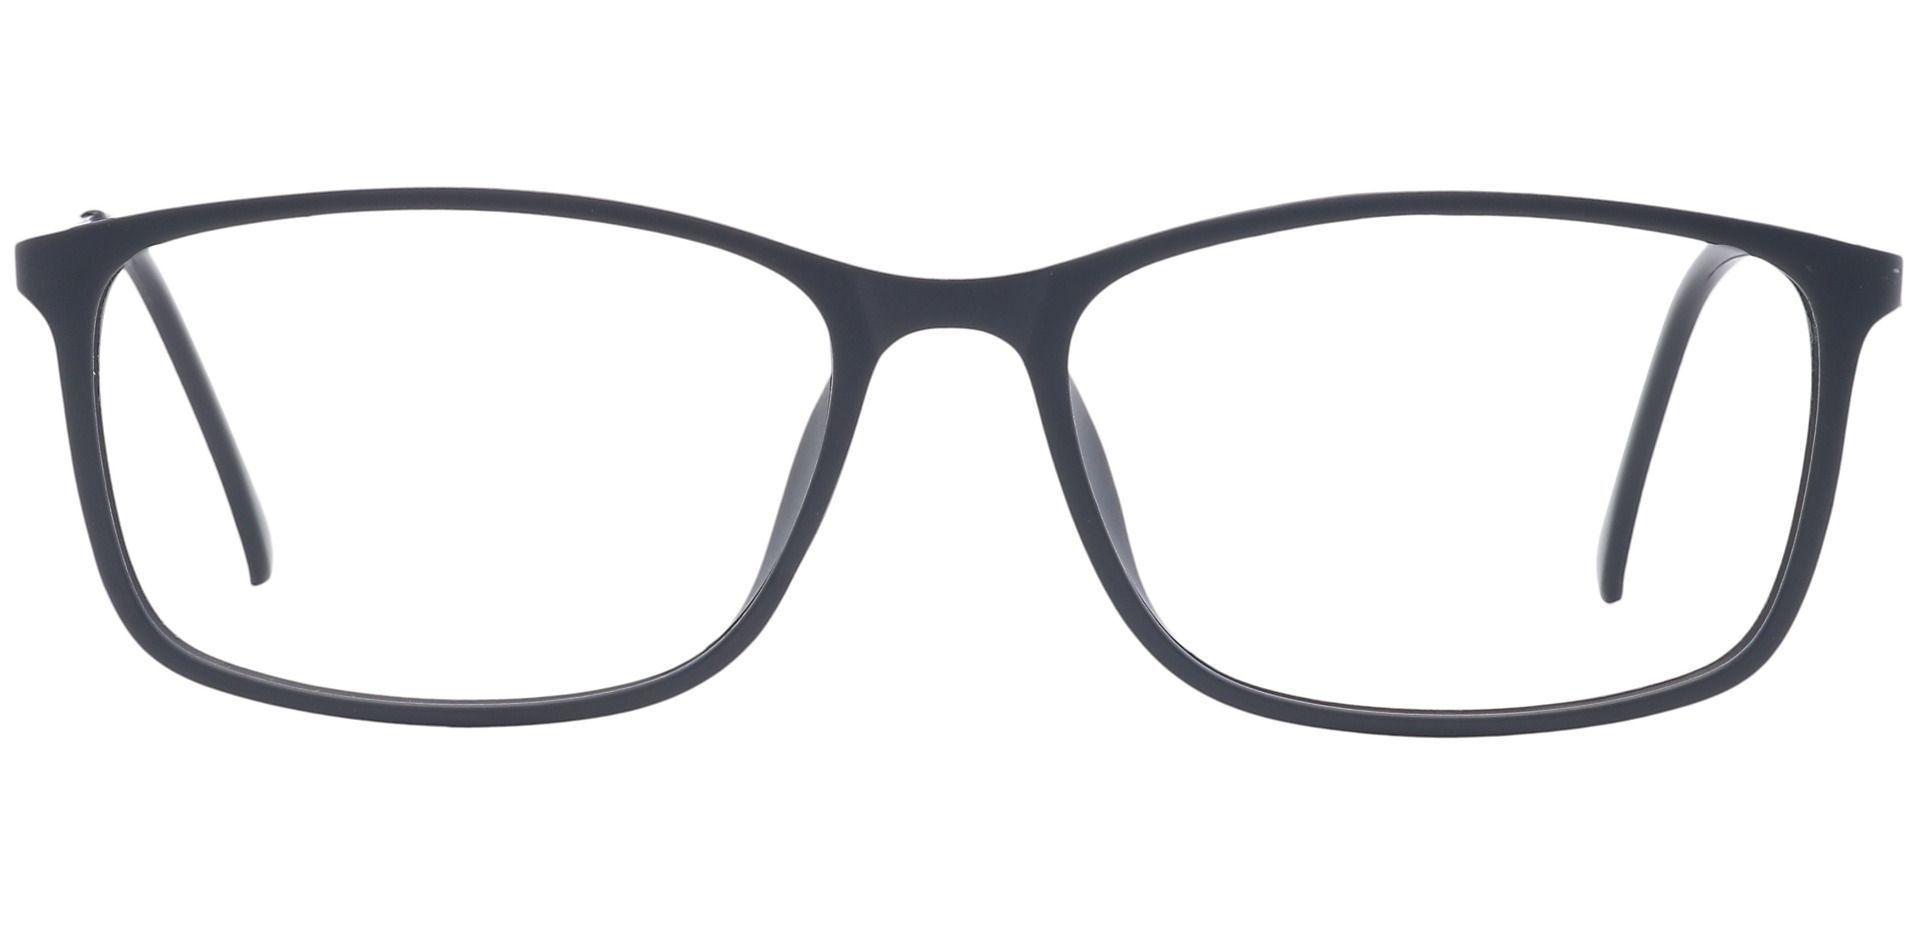 Benson Rectangle Prescription Glasses - Black